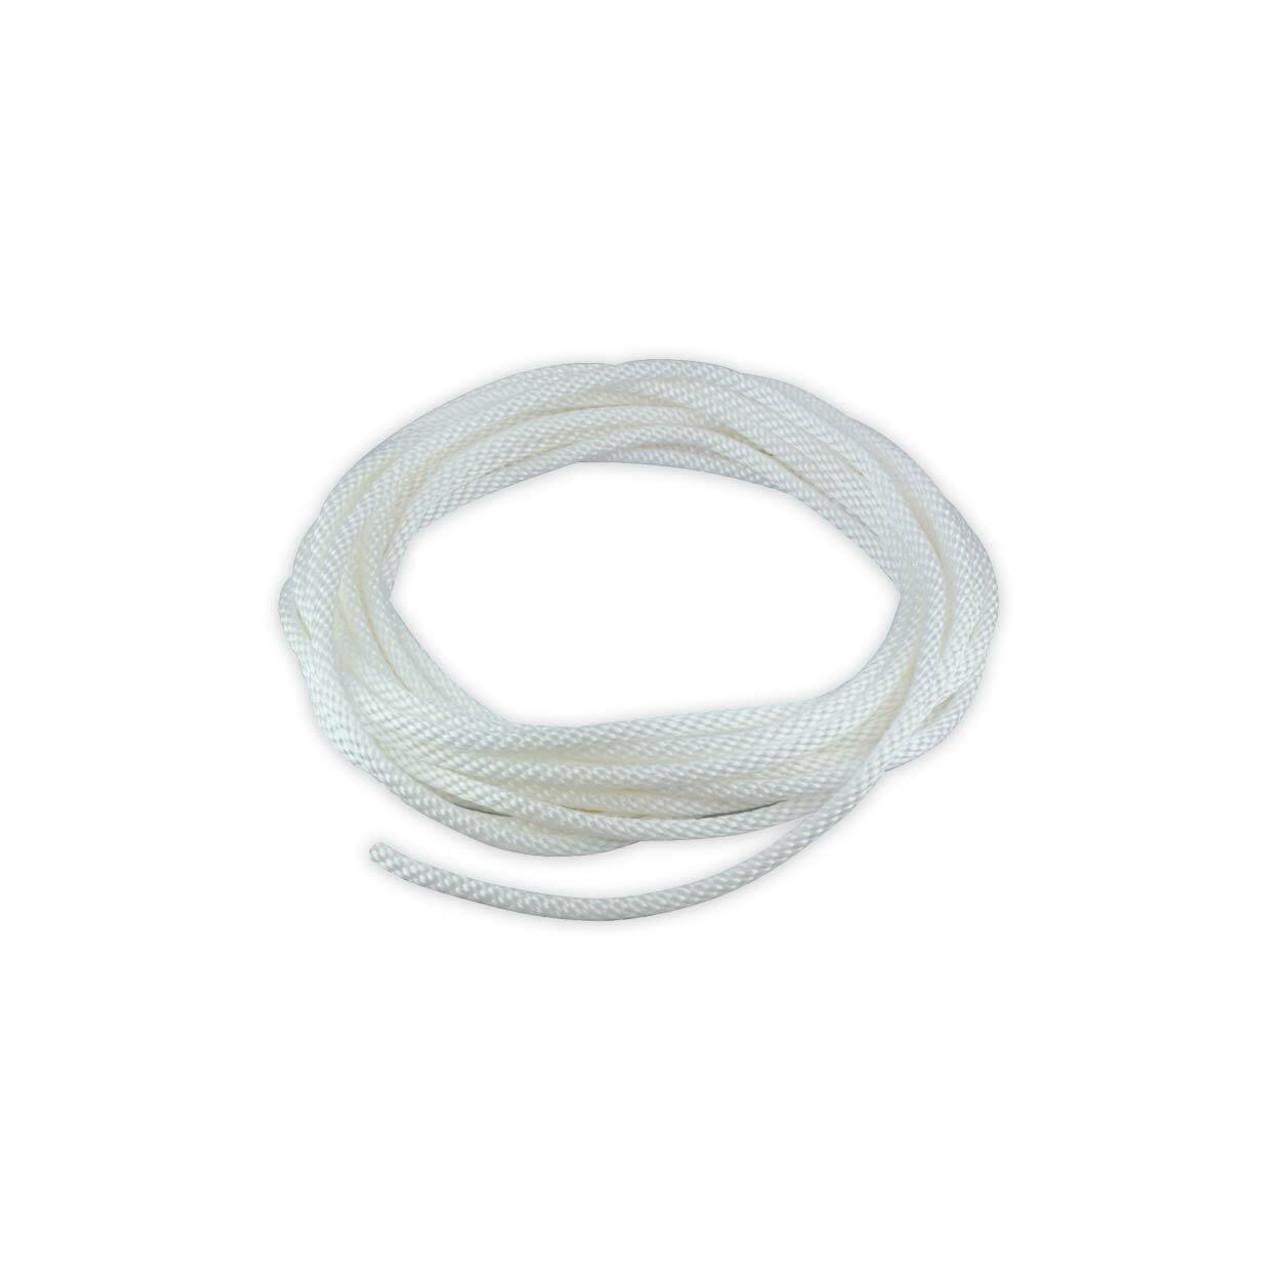 Halyard(rope)